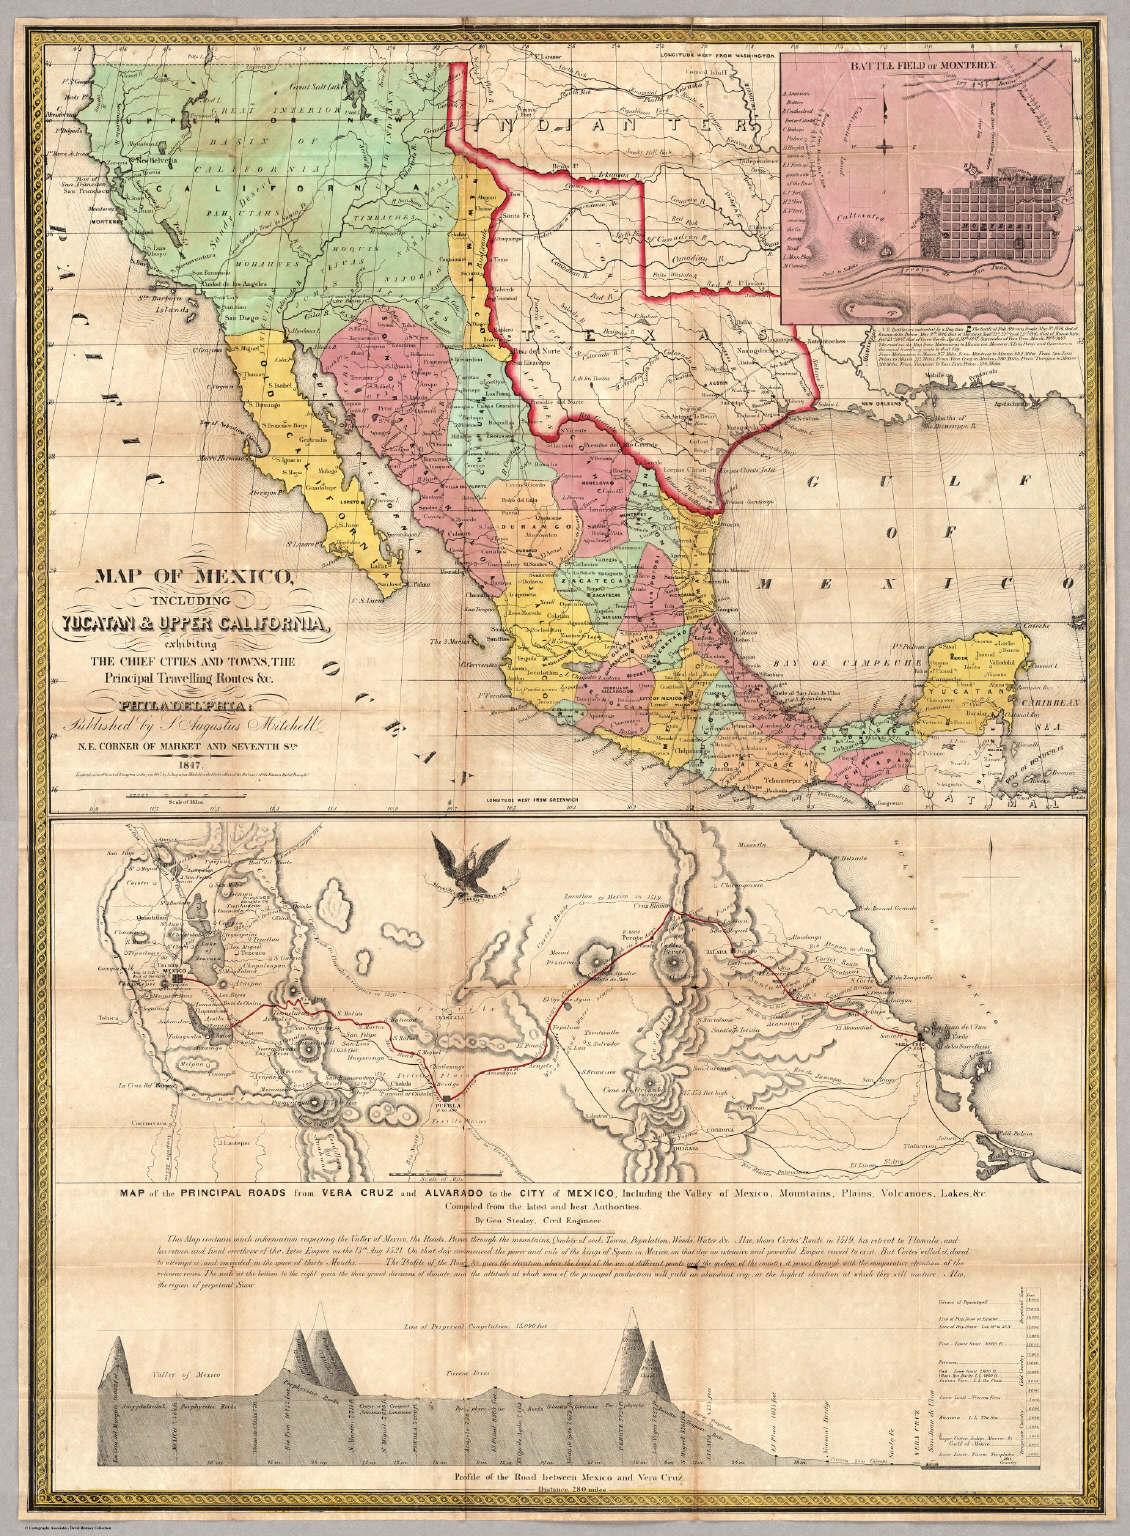 Map Of Mexico, Including Yucatan & Upper California. - David Rumsey ...